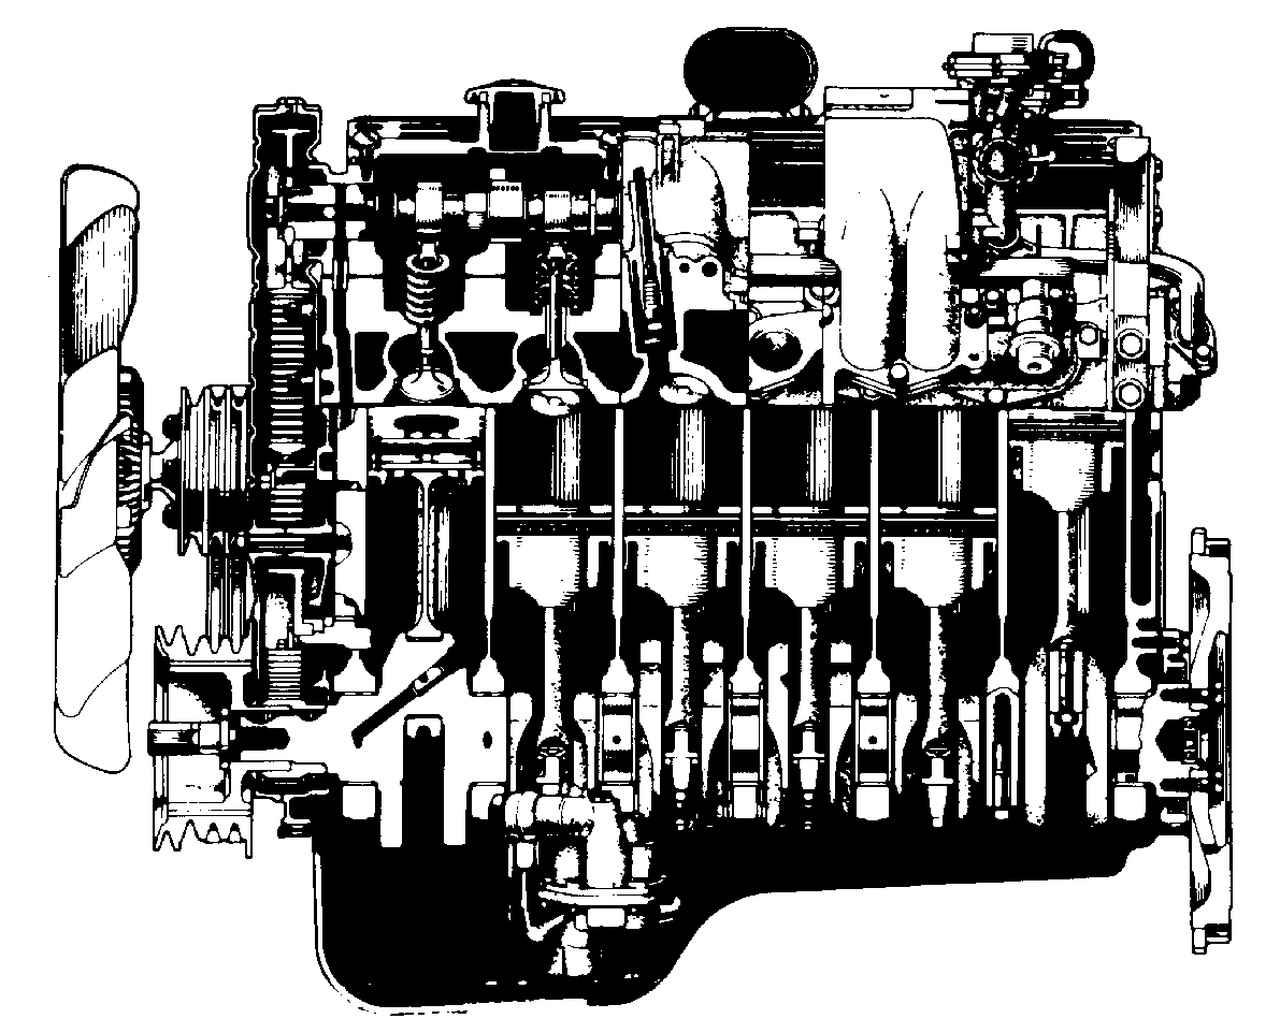 Images : 10番目の画像 - 新時代を切り拓いた初代ソアラと5M-GEU型エンジン - Webモーターマガジン